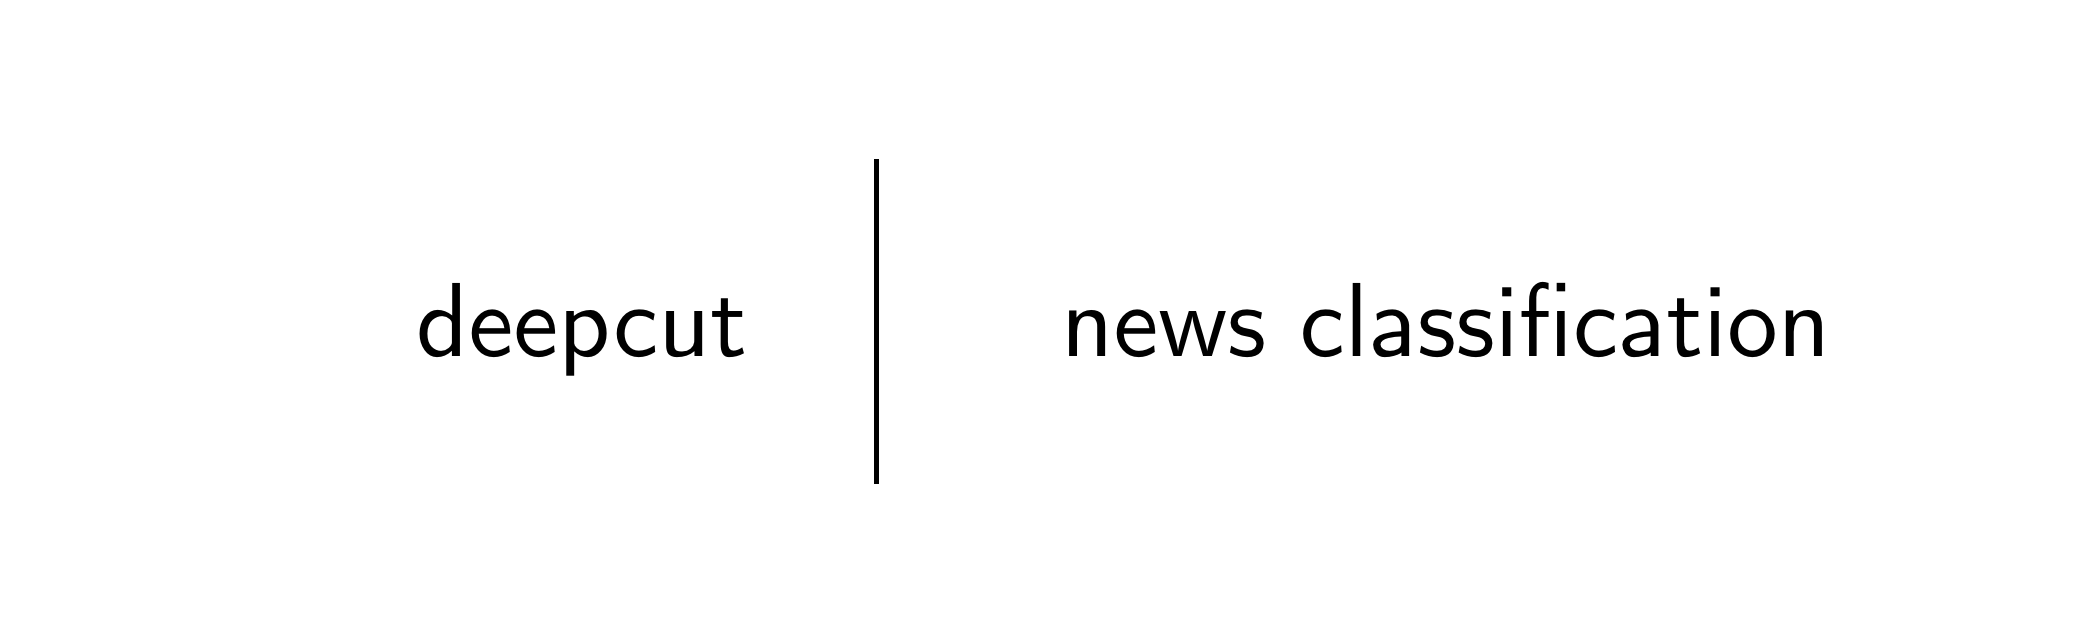 Deepcut มาคัดข่าว